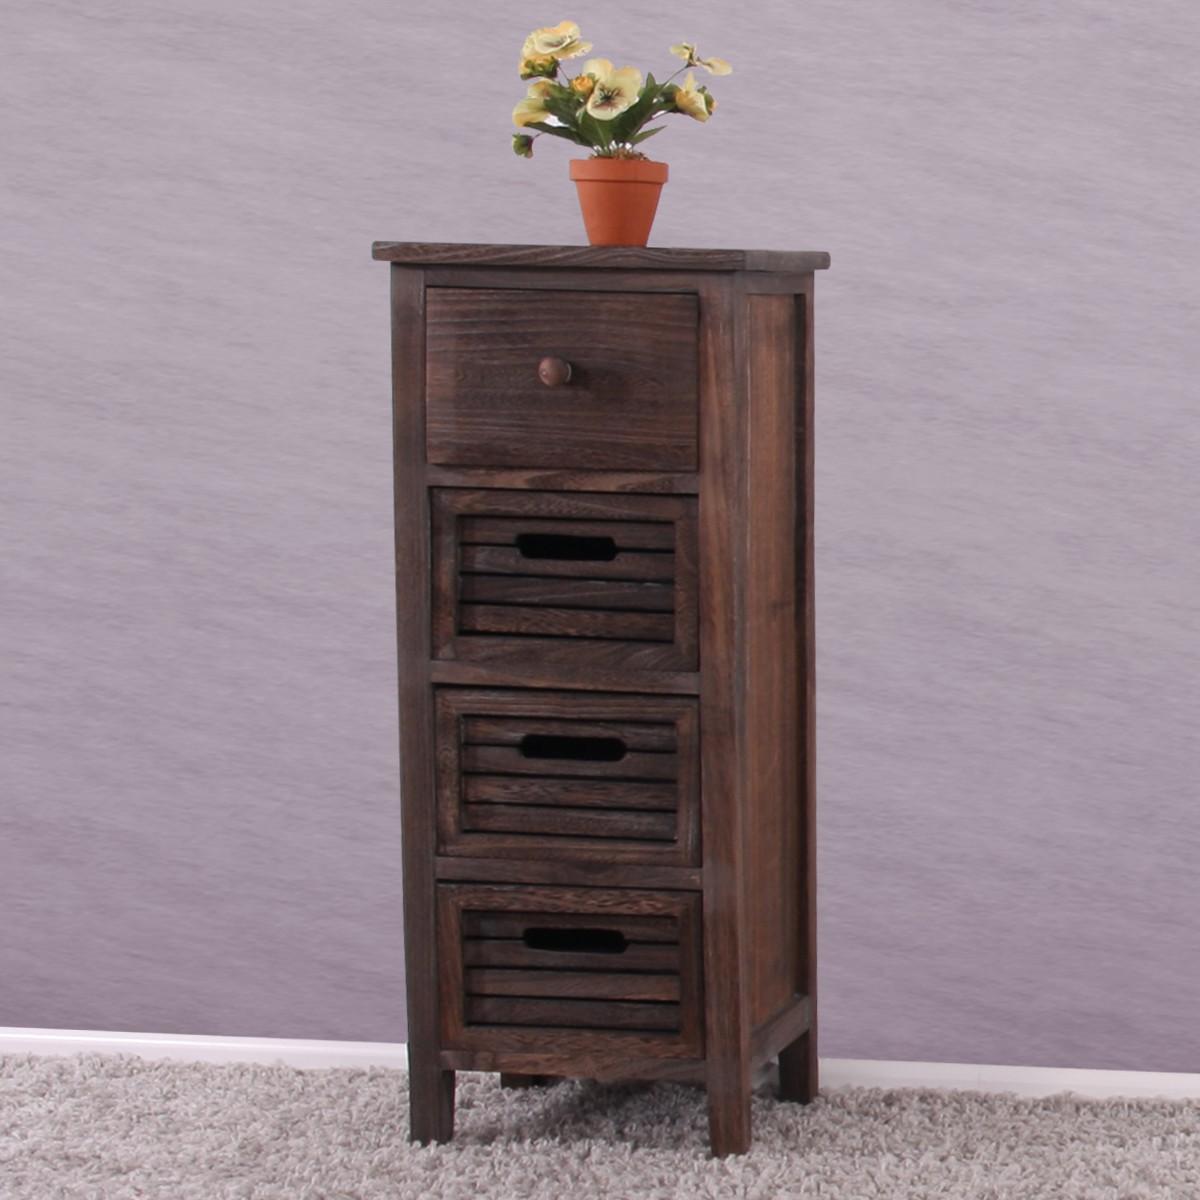 shabby kommode 74x30x25cm vintage braunun. Black Bedroom Furniture Sets. Home Design Ideas